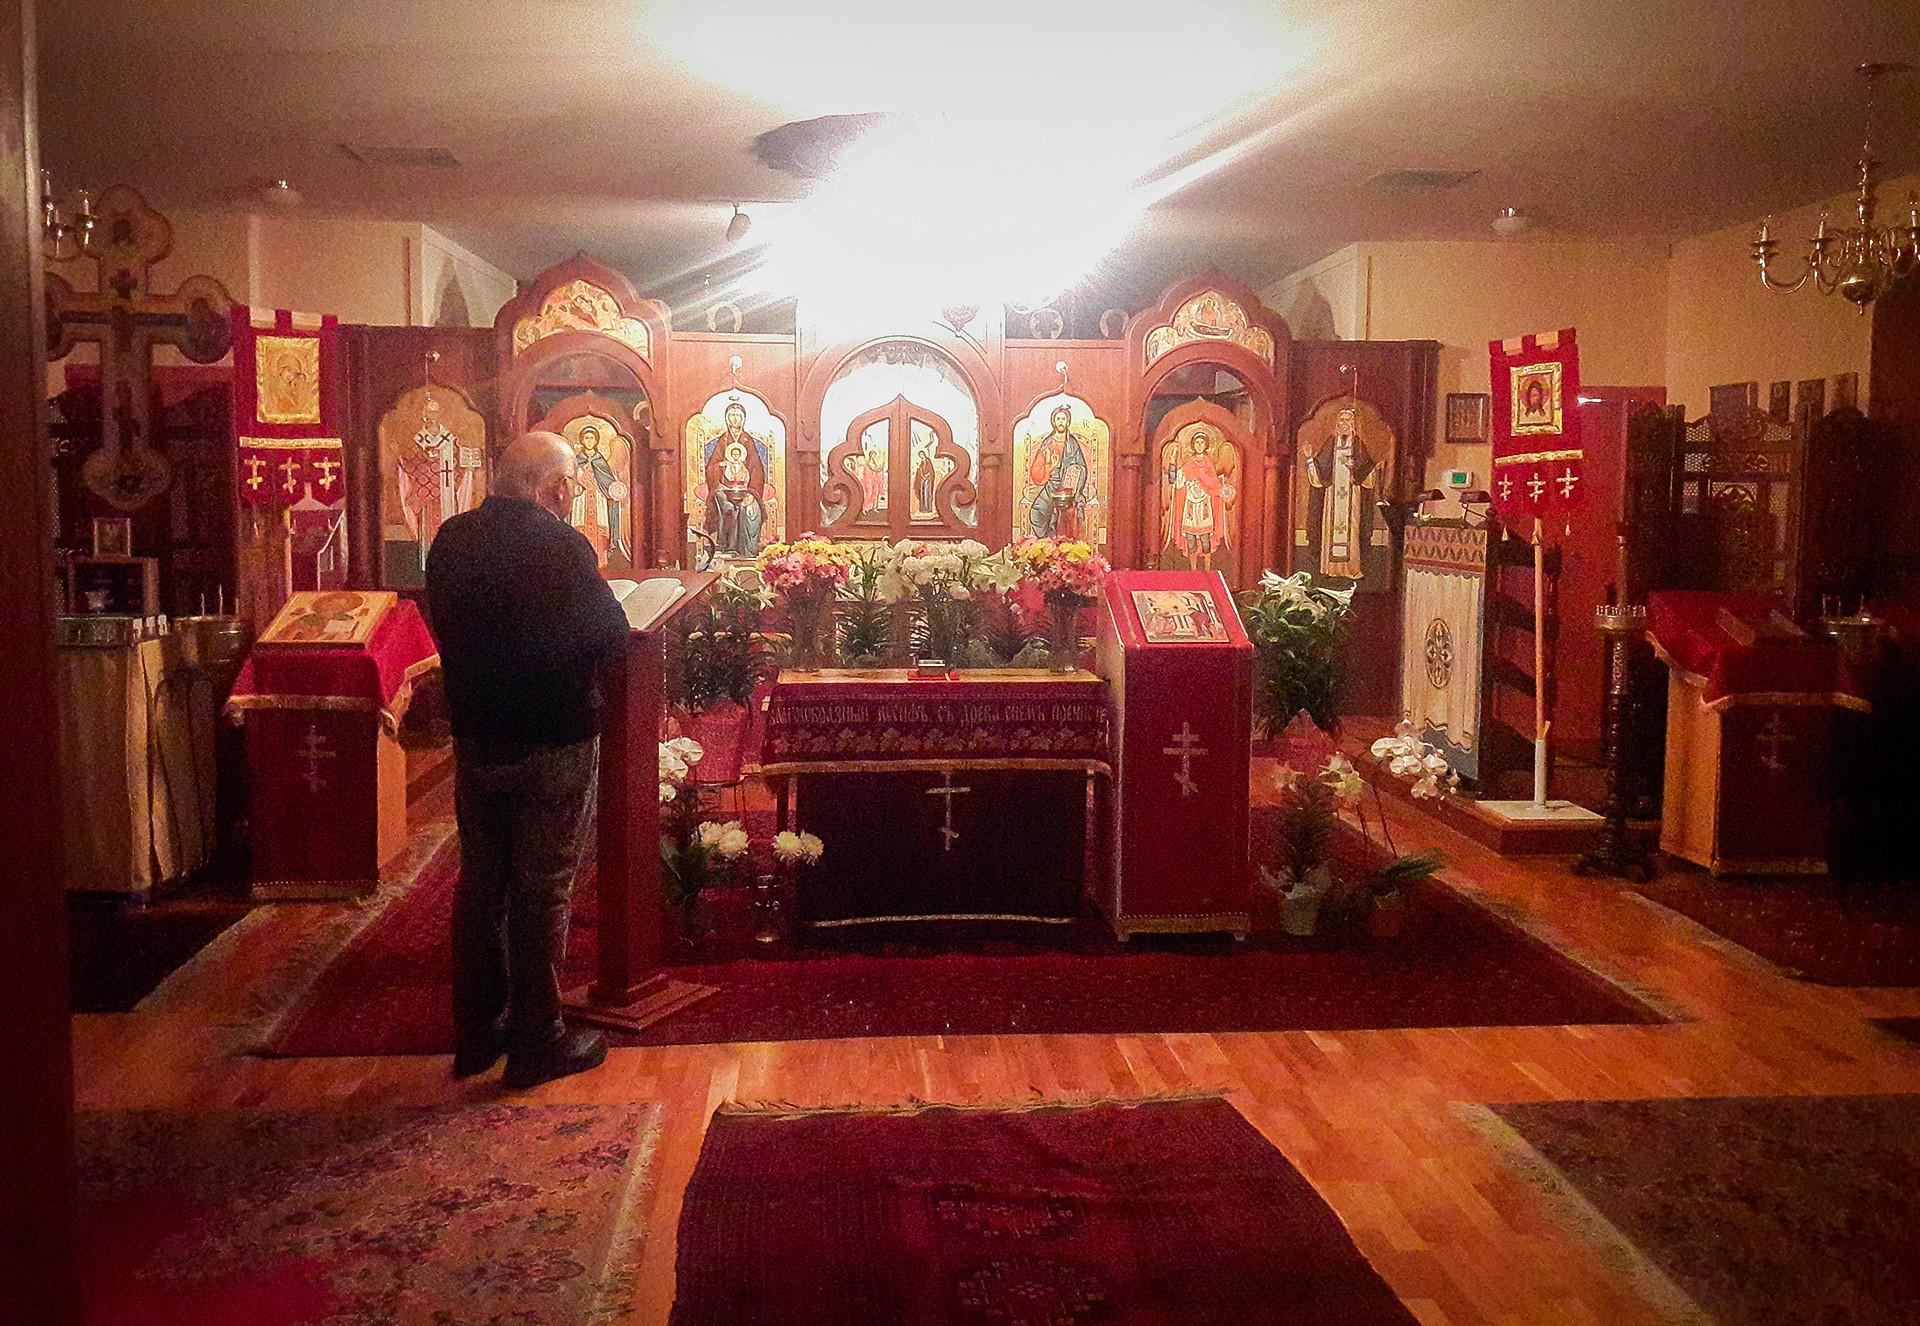 Овогодишњи Васкрс. Читање Псалтира у храму.